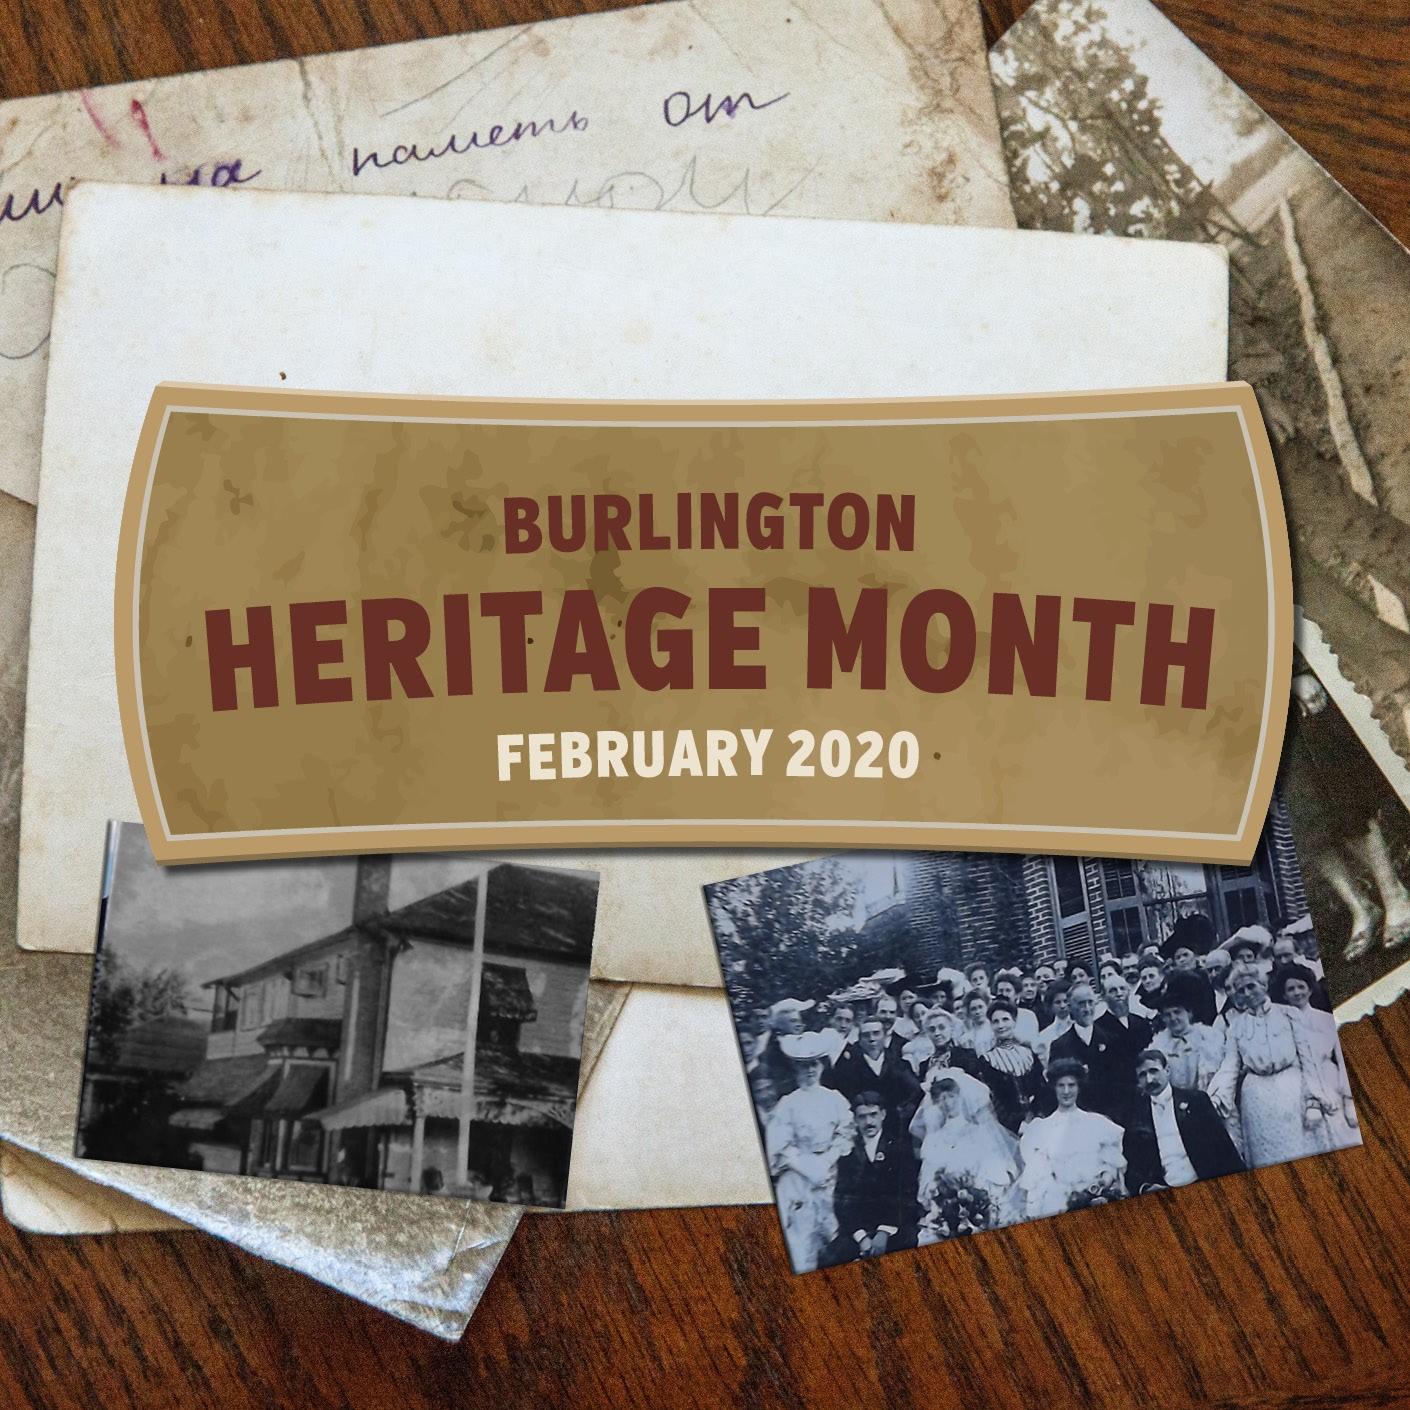 Heritage Month kicks off Feb. 1, 2020